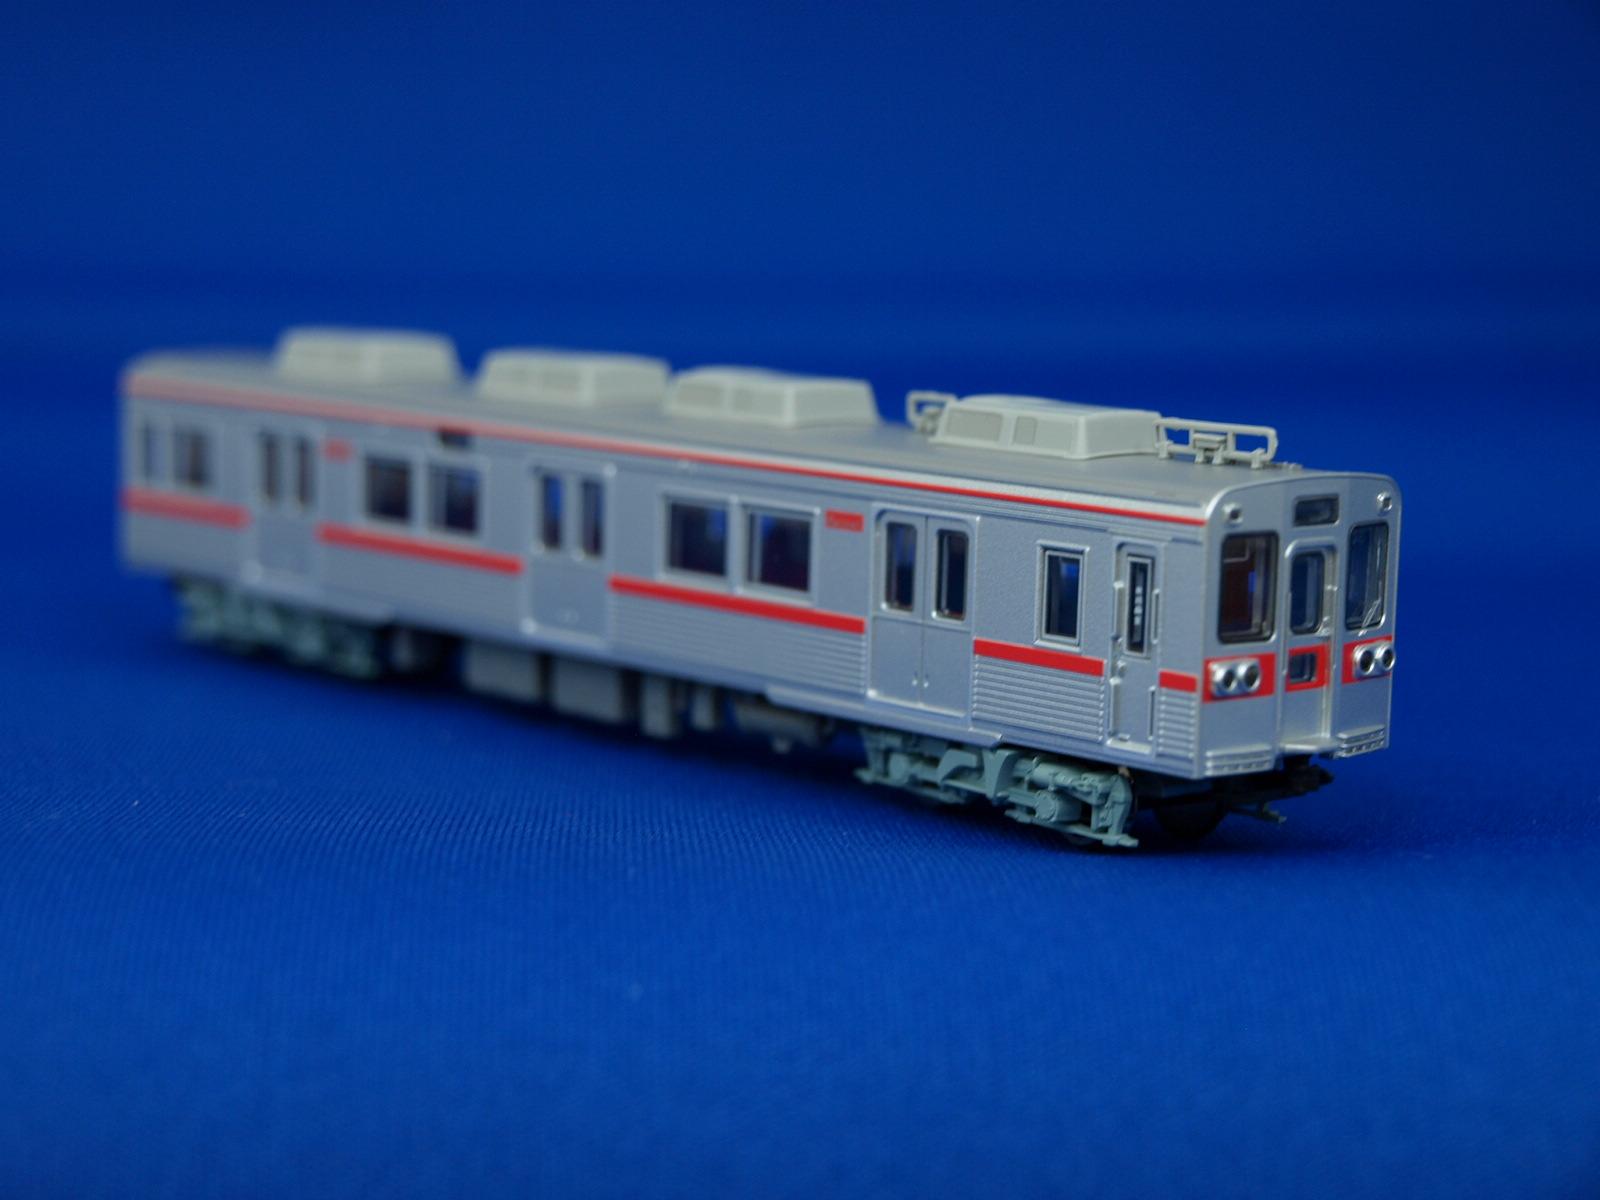 Nゲージ トミックス 98301 JR E231-3000系通勤電車(川越・八高線)4両セット